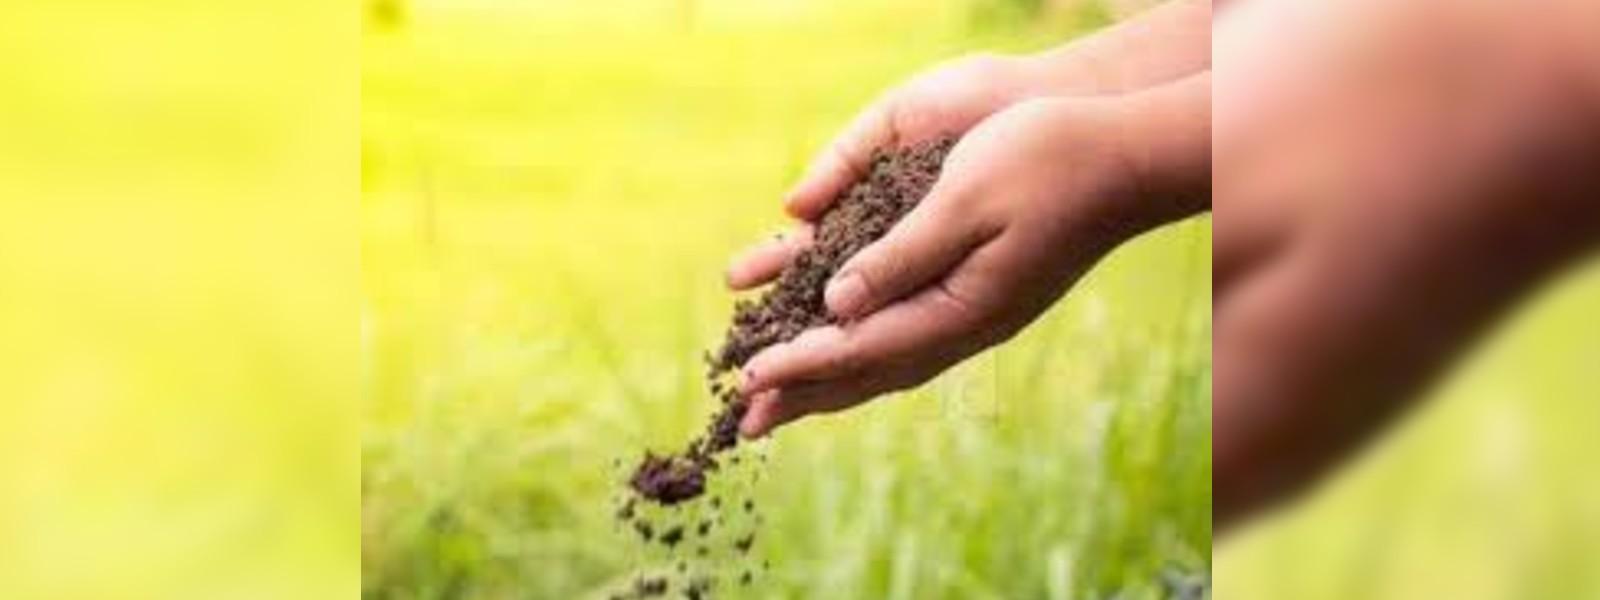 Farmers inconvenienced due to shortage of fertilizer